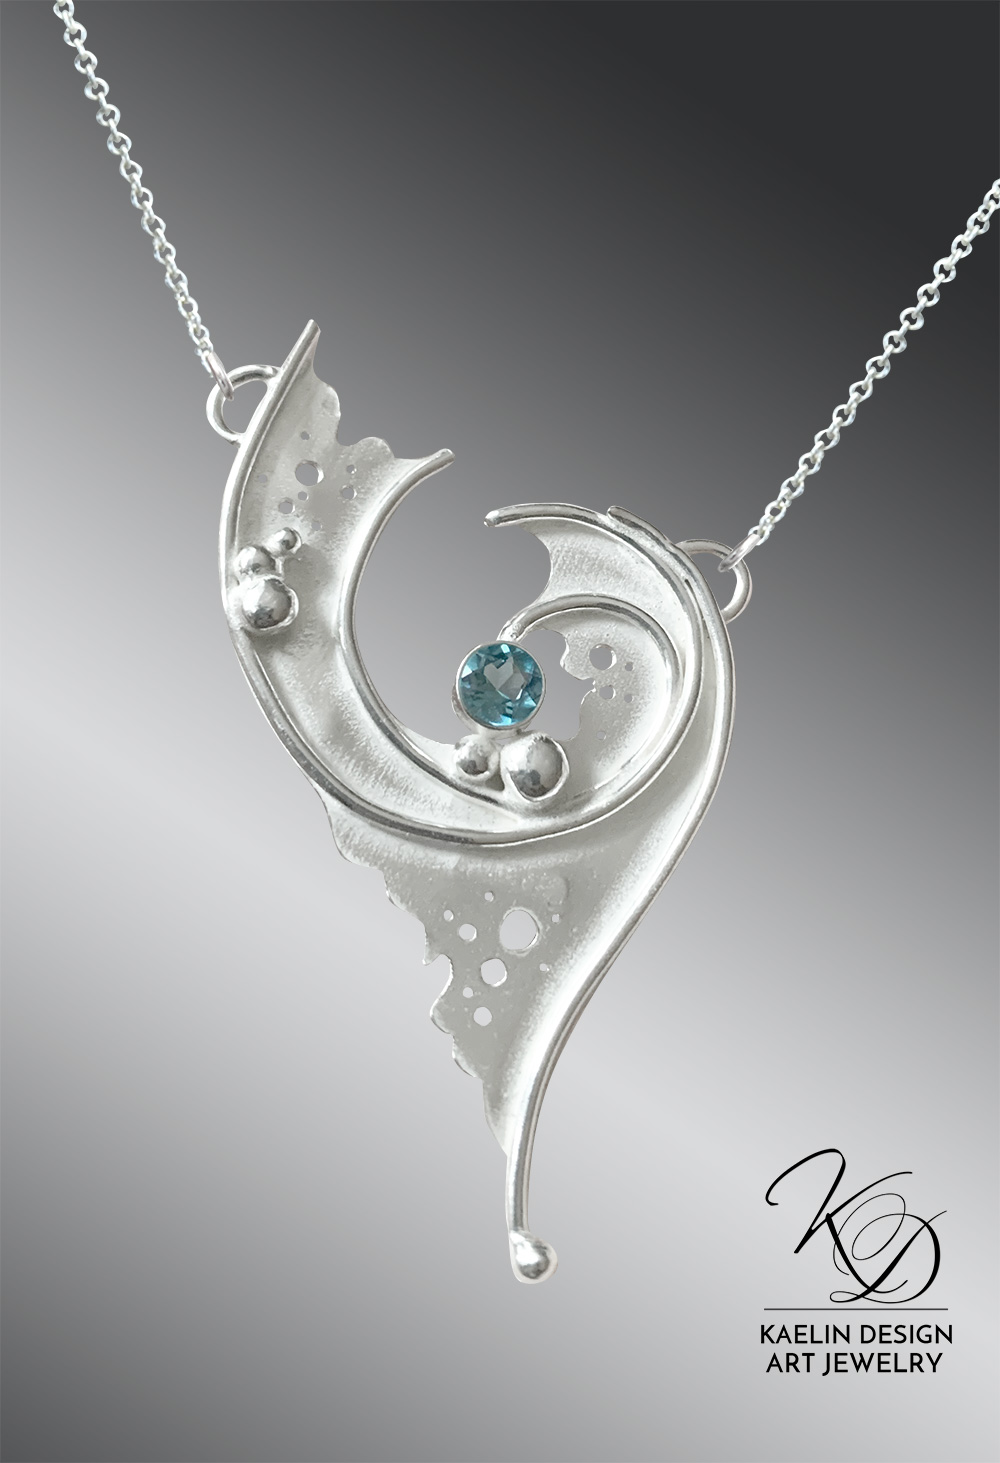 Lagoon Blue Topaz Sterling Silver Art Jewelry Pendant by Kaelin Design